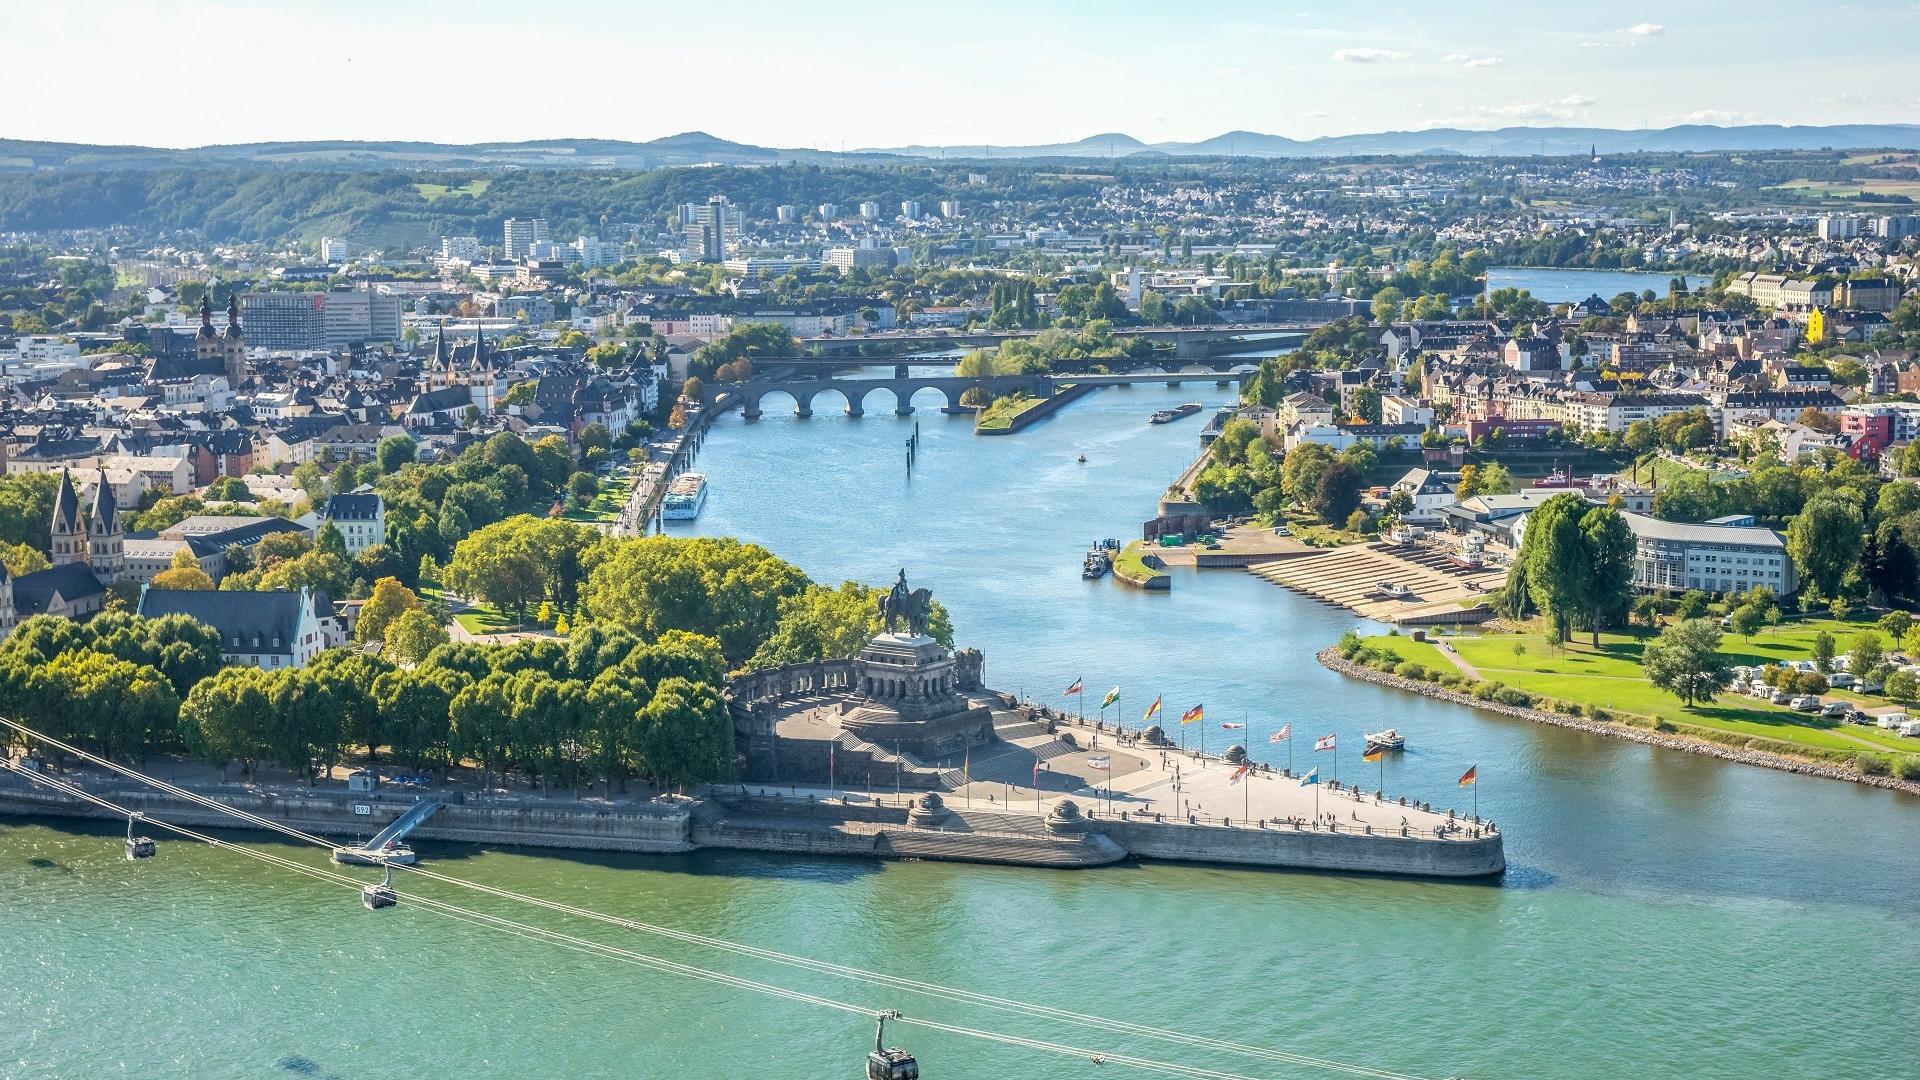 Dagaanbieding - 3-dagen-luxe-4*-hotel-bij-Koblenz-incl.-ontbijt-en-dinerbuffet dagelijkse koopjes